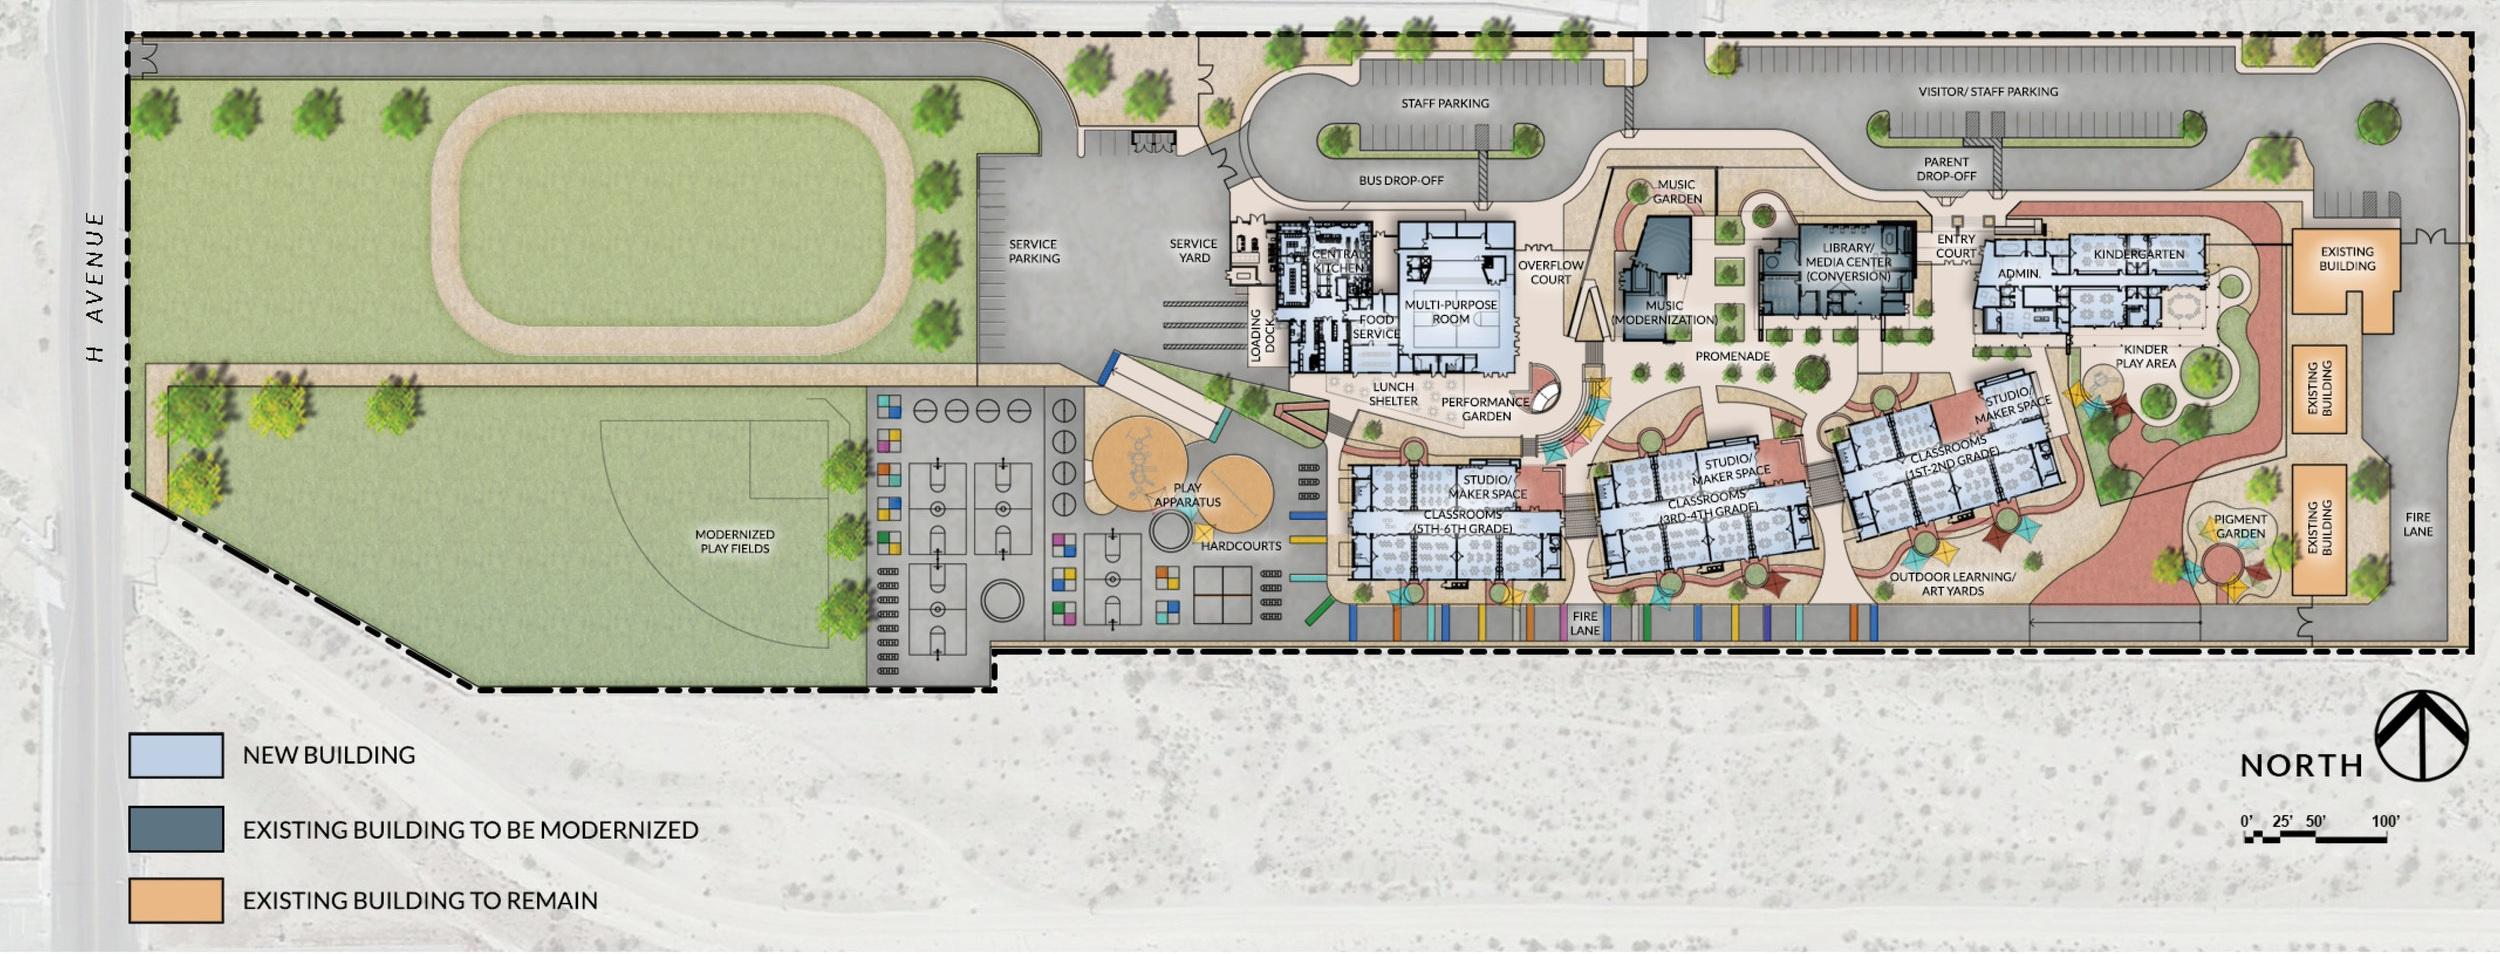 Barstow+FAA+Site+Plan+enlarged.jpg